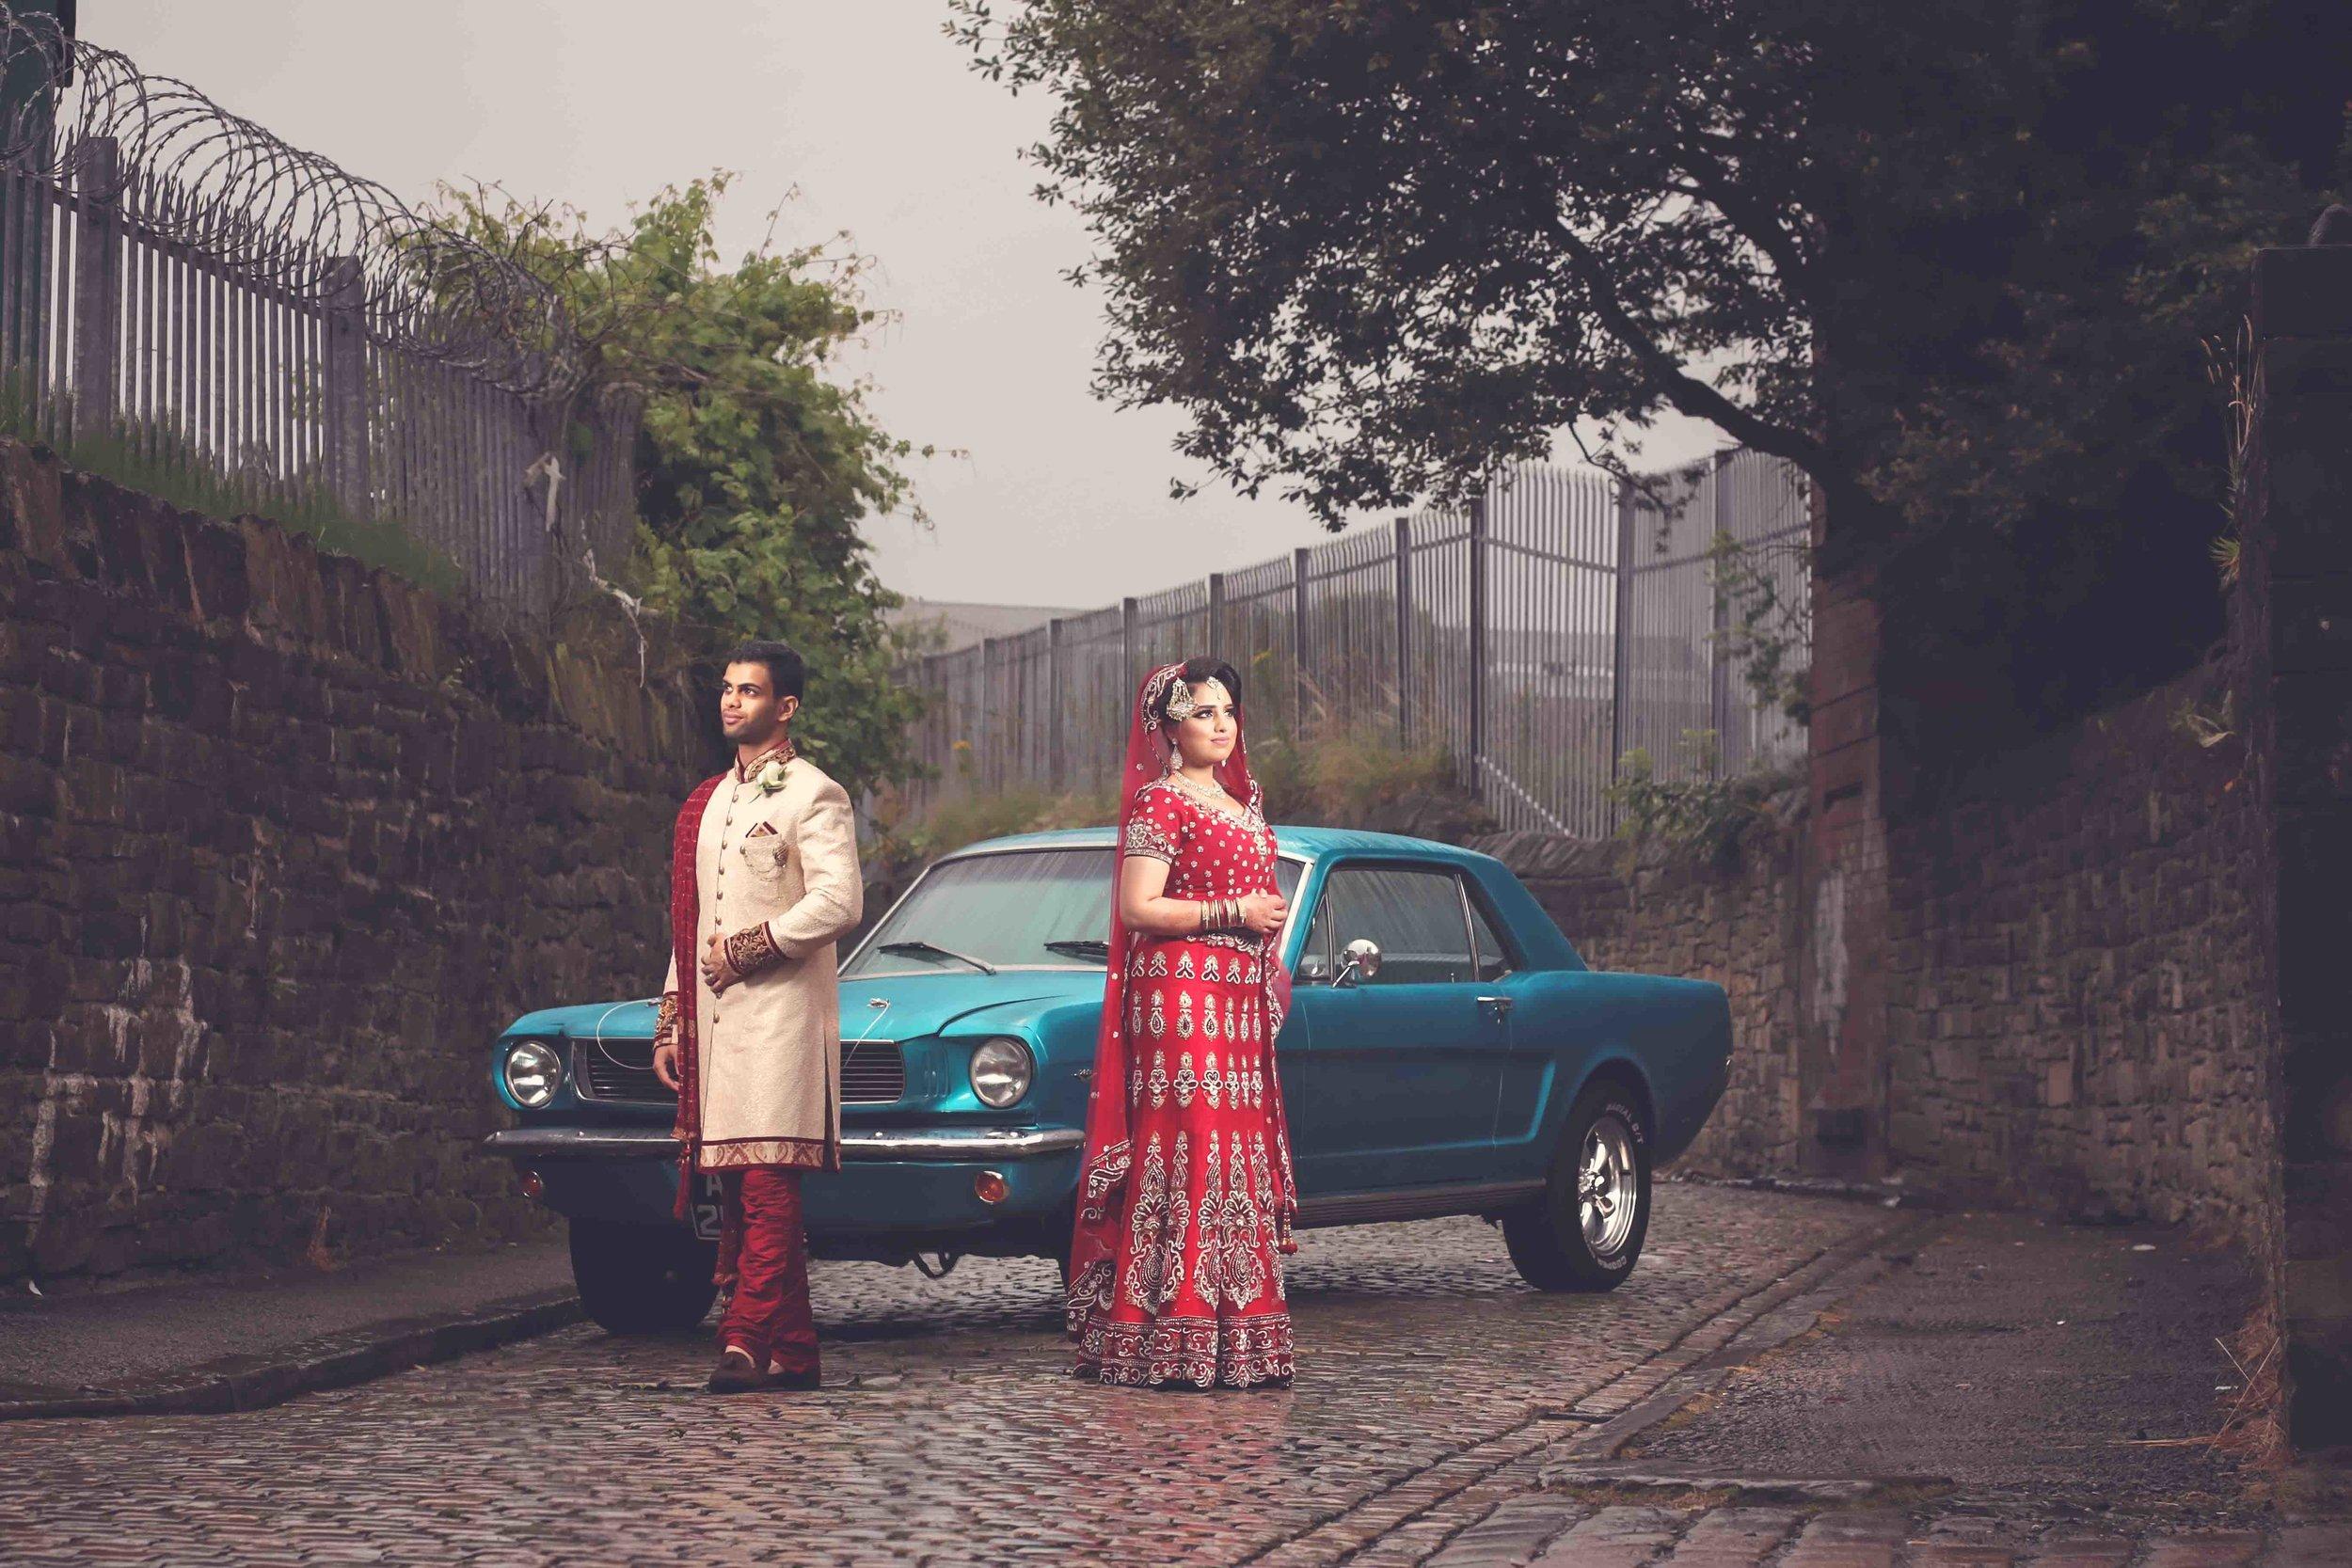 Asian Wedding Photographer Opu Sultan Photography Lyme Park Scotland Edinburgh Glasgow London Manchester Liverpool Birmingham Wedding Photos prewed shoot Jams & Tams Blod-84.jpg